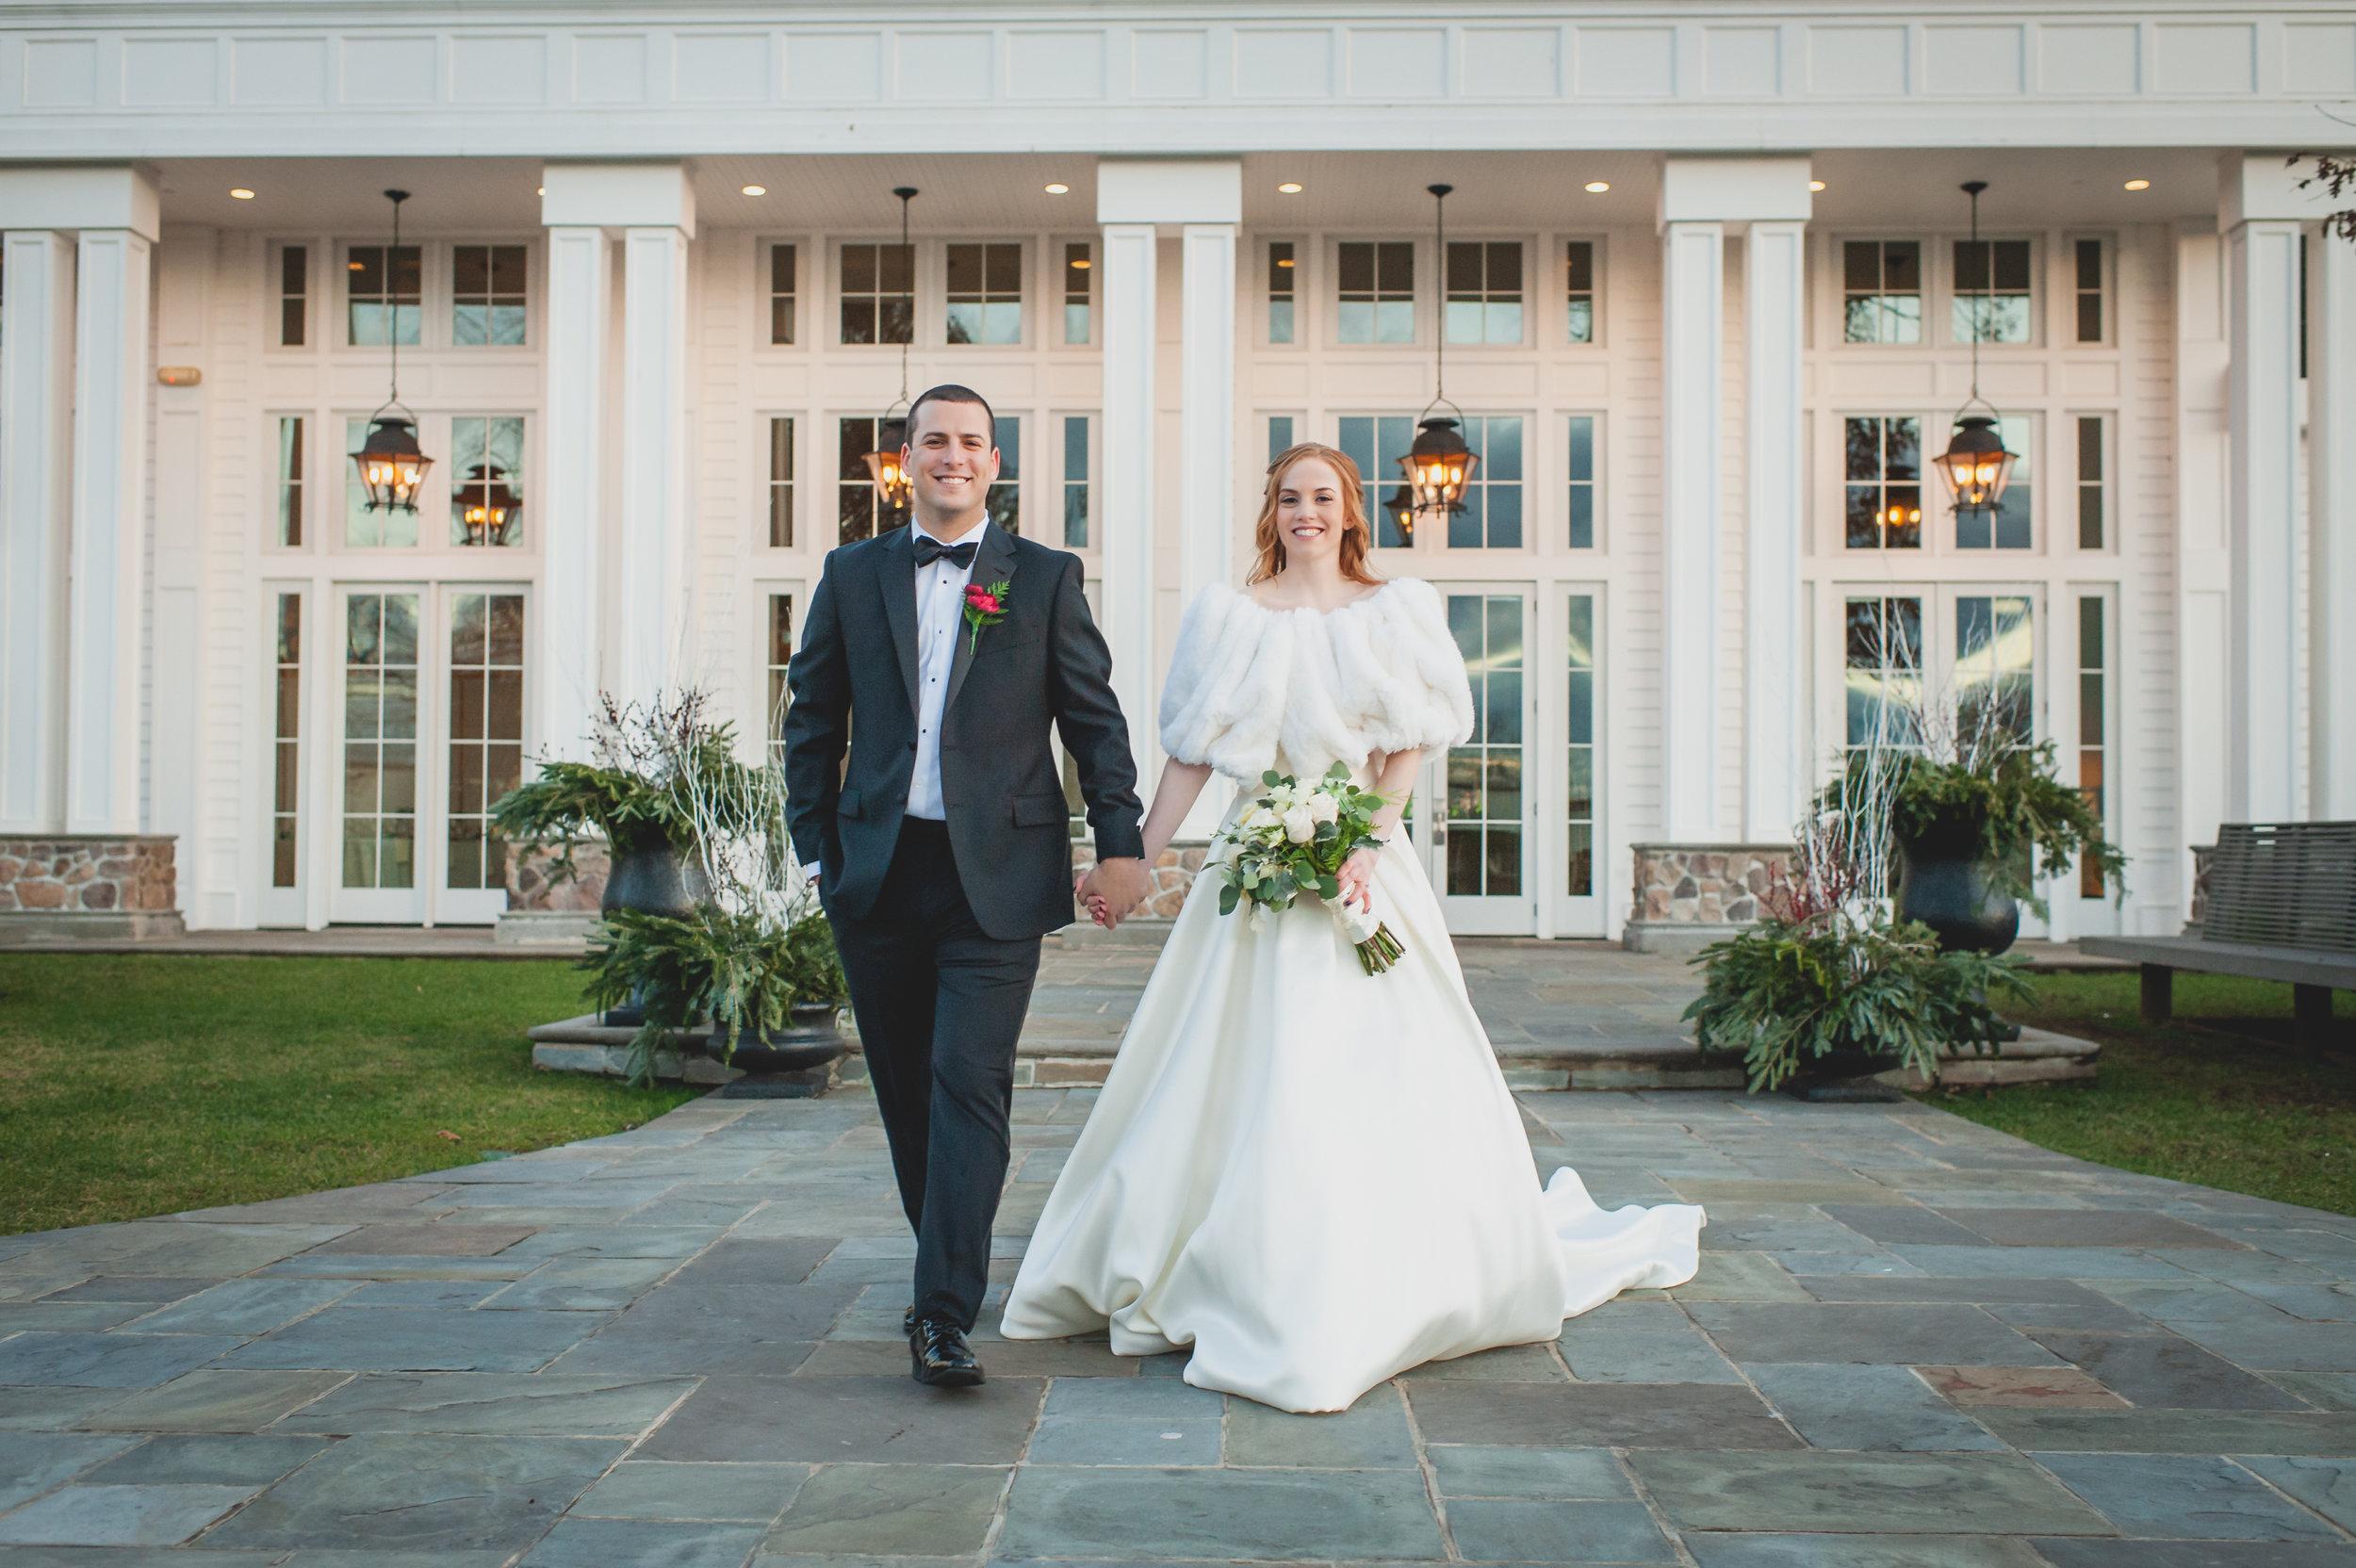 Whitehouse Station, NJ Wedding Venue - The Ryland Inn - Couples Photoshoot